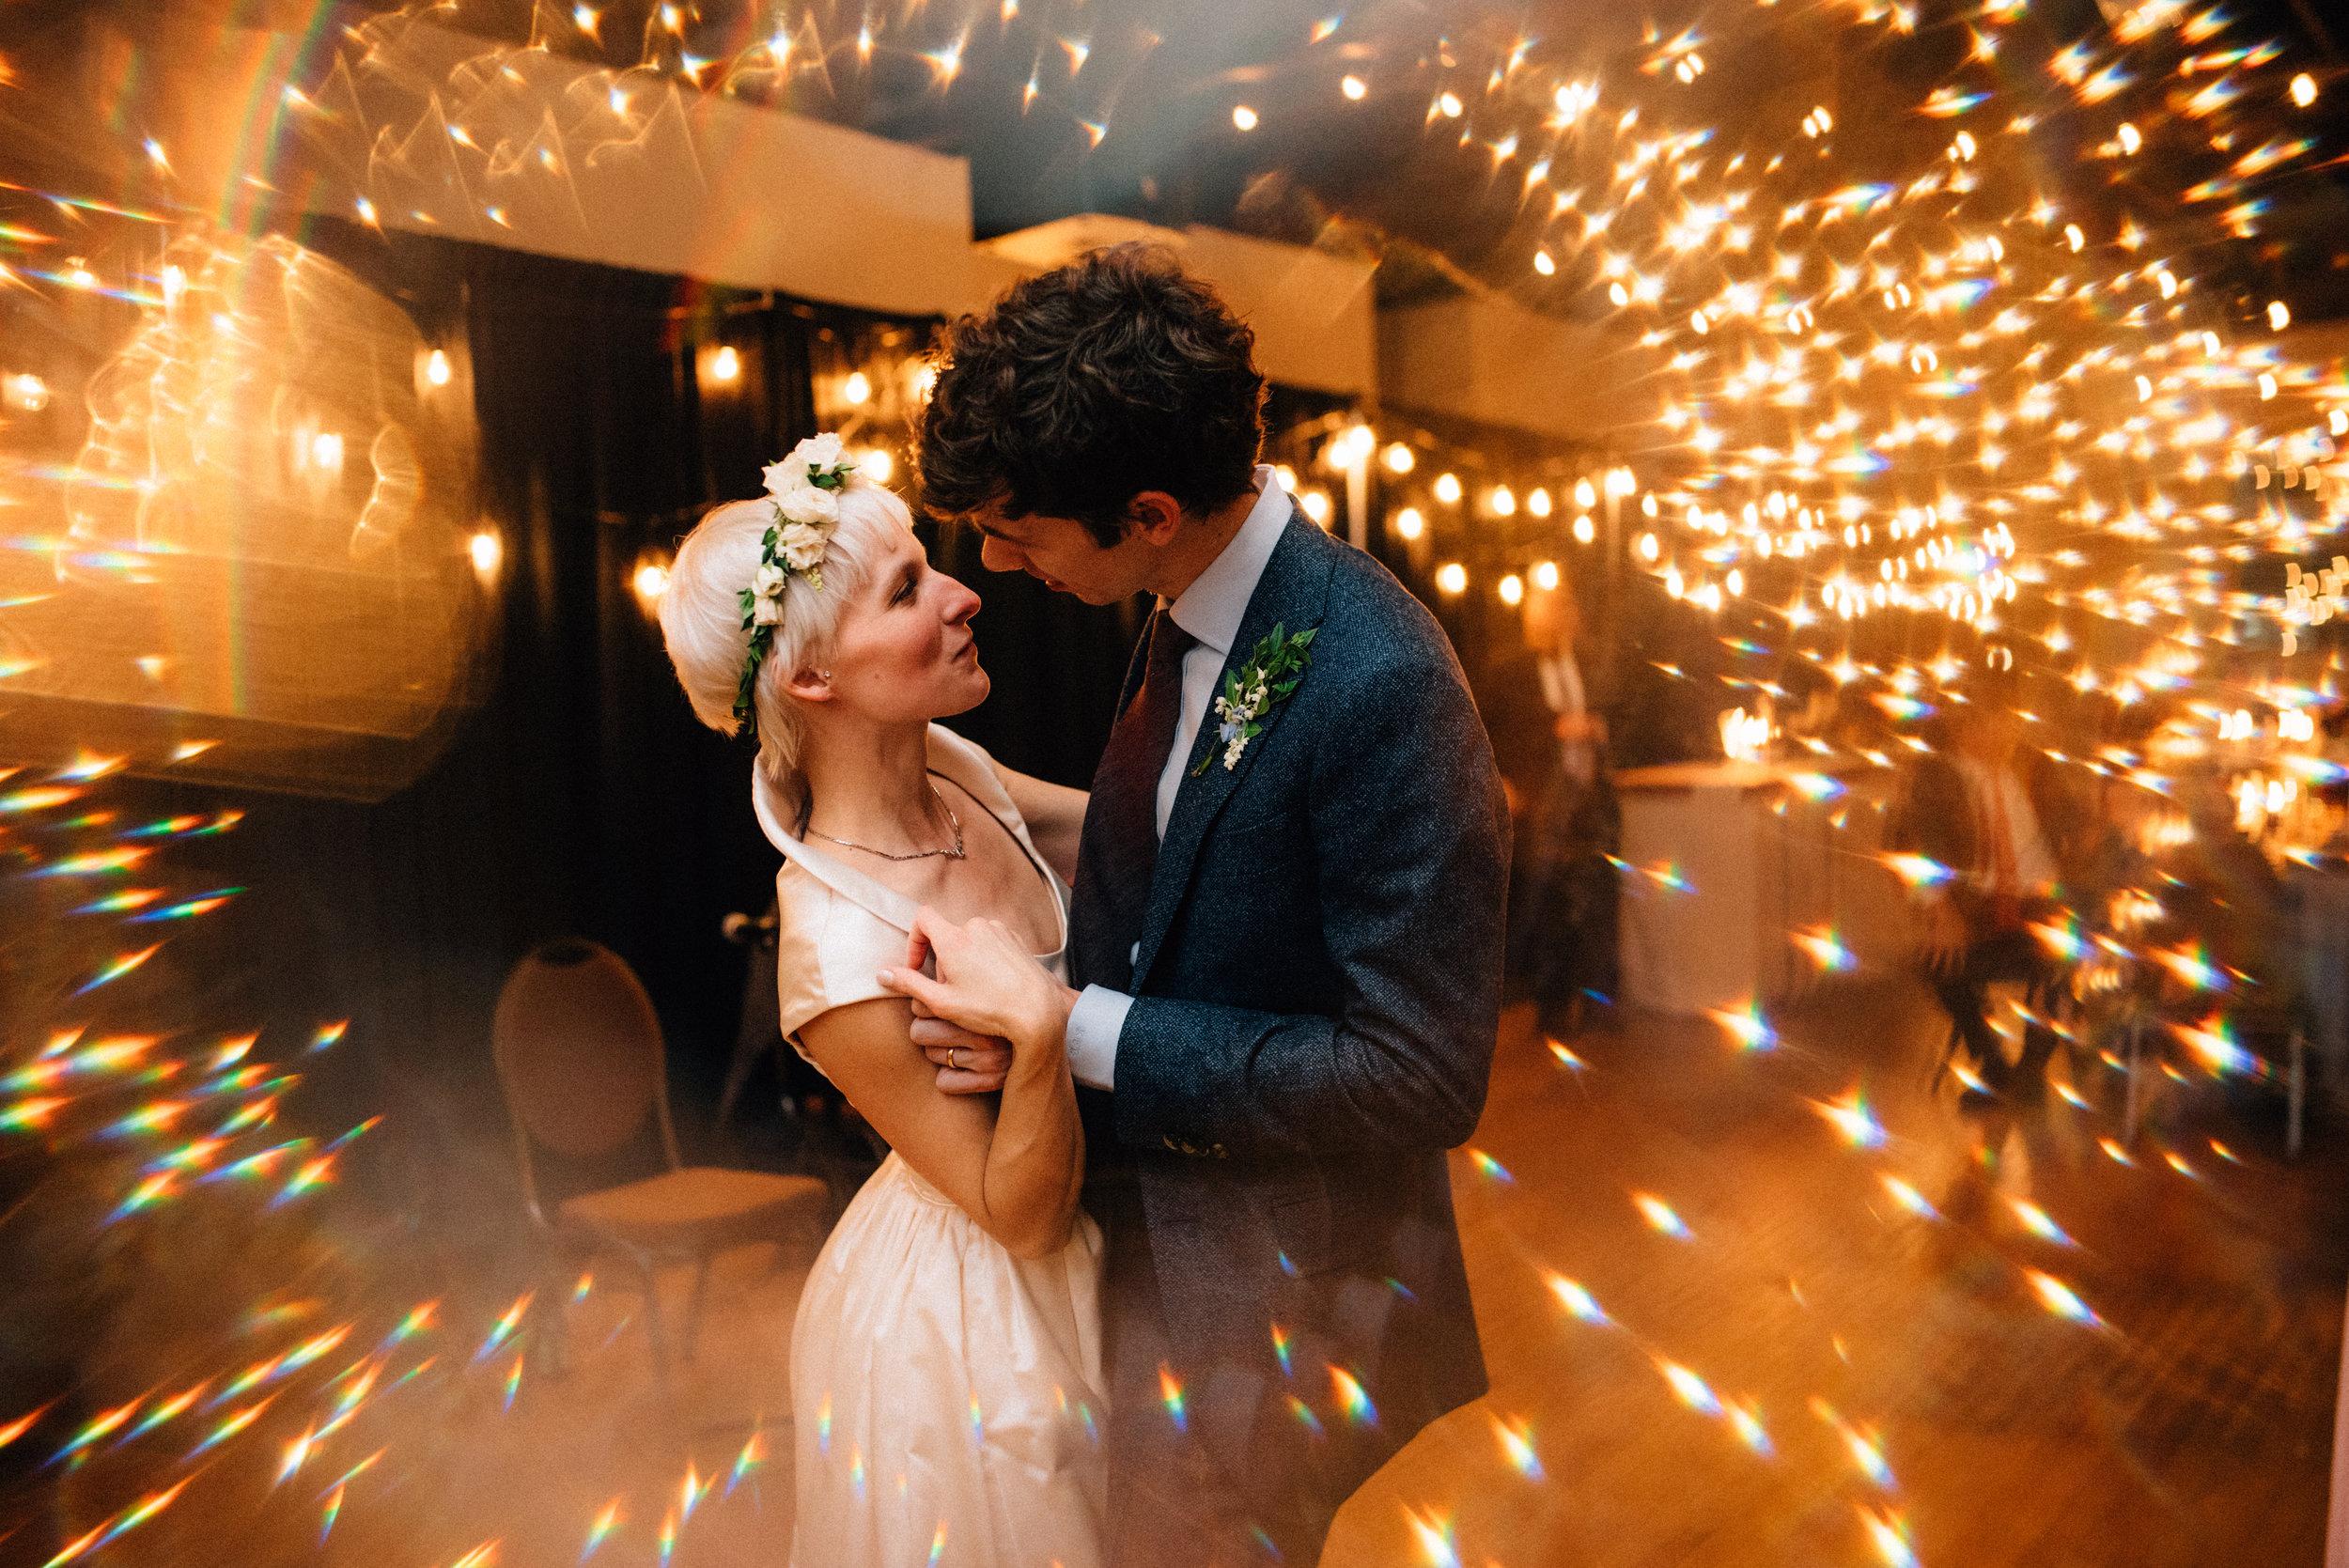 raleigh wedding photographer - north carolina wedding photographer - winter wedding - historic mordecai wedding